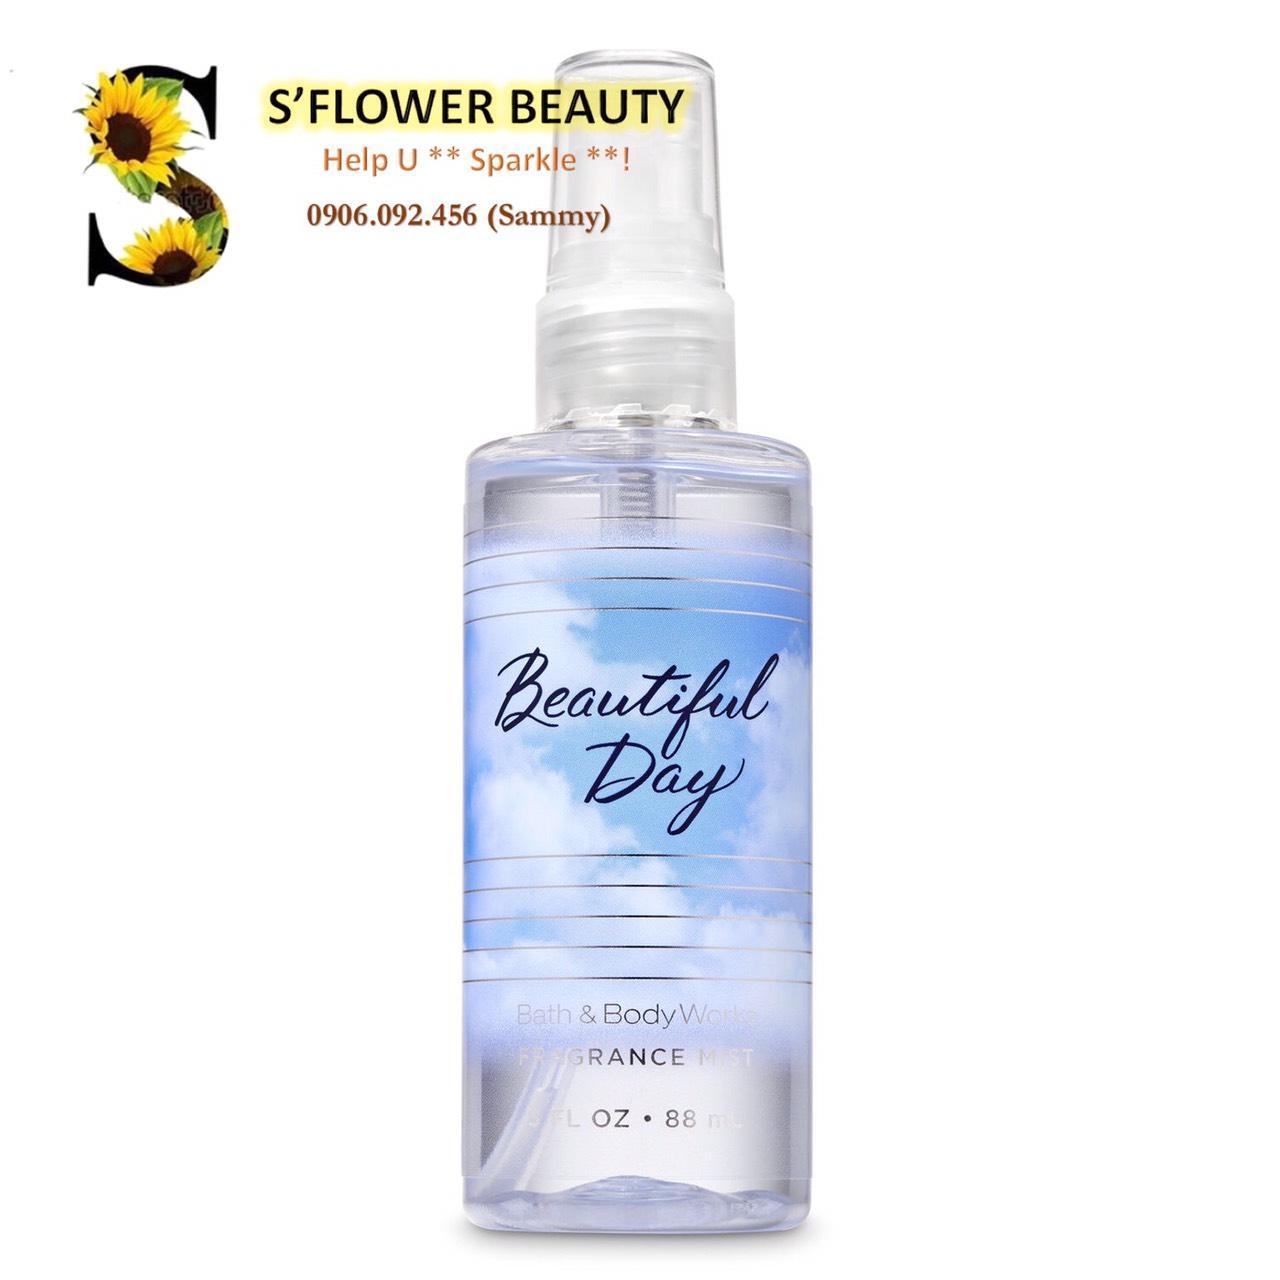 [Auth - Size Mini] Xịt Thơm Nước Hoa Toàn Thân Bath & Body Works Fine Fragrance Mist (88ml) - Beautiful Day (2019)